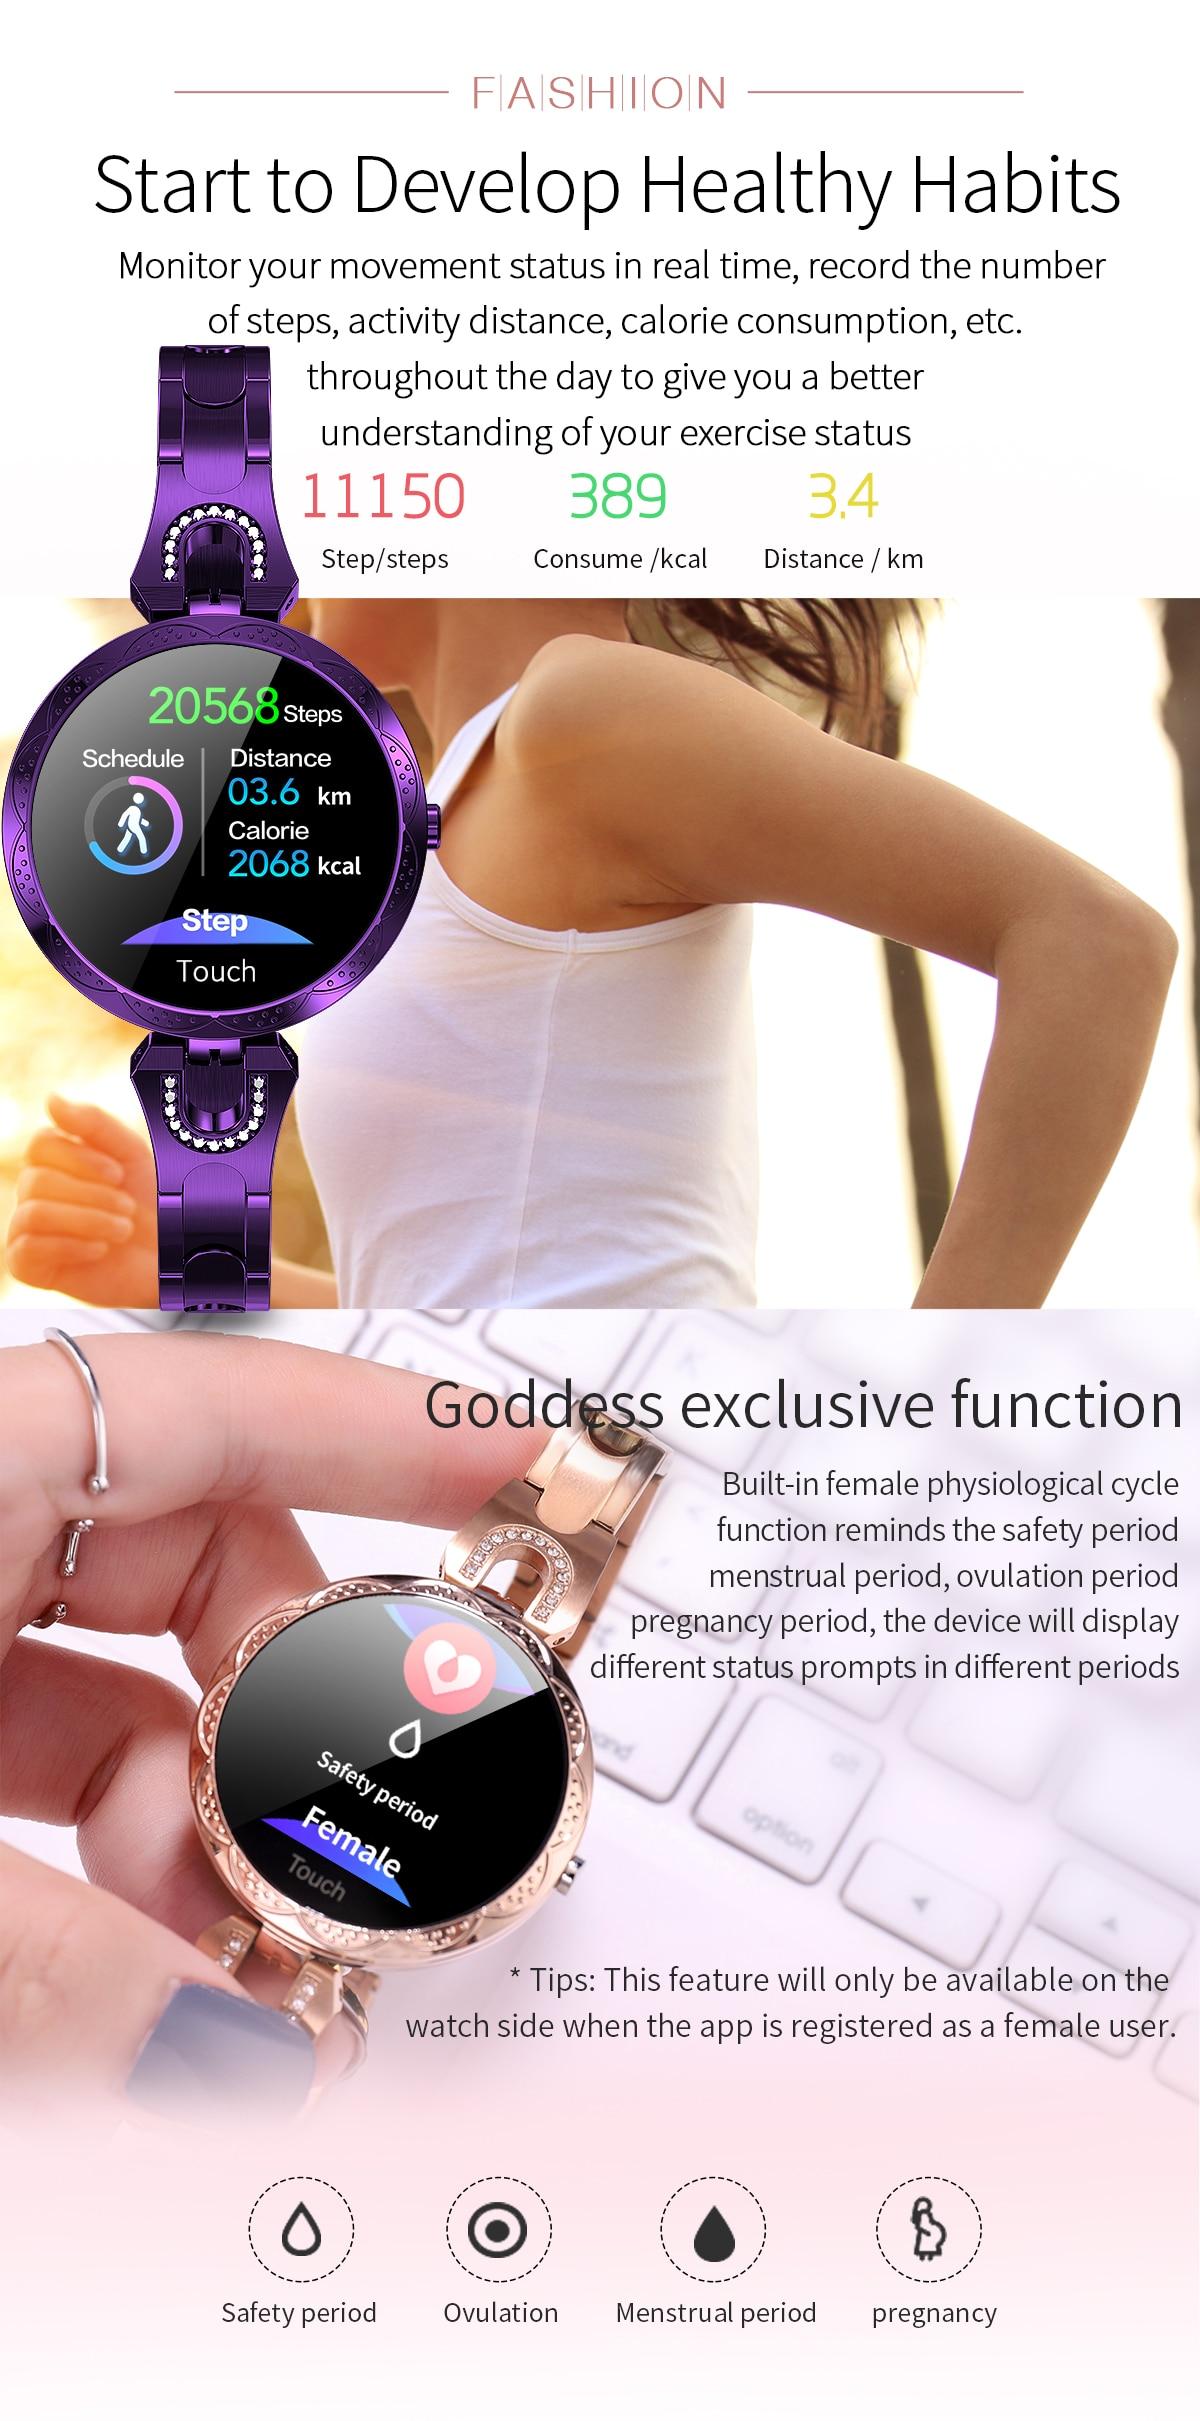 H066e19a923ae4fc7ac9e82f06415bb05e COBRAFLY AK15 Smart Watch Women Bracelet Heart Rate Monitoring IP67 Waterproof Fitness Tracker Ladies Watches for Xiaomi Iphone